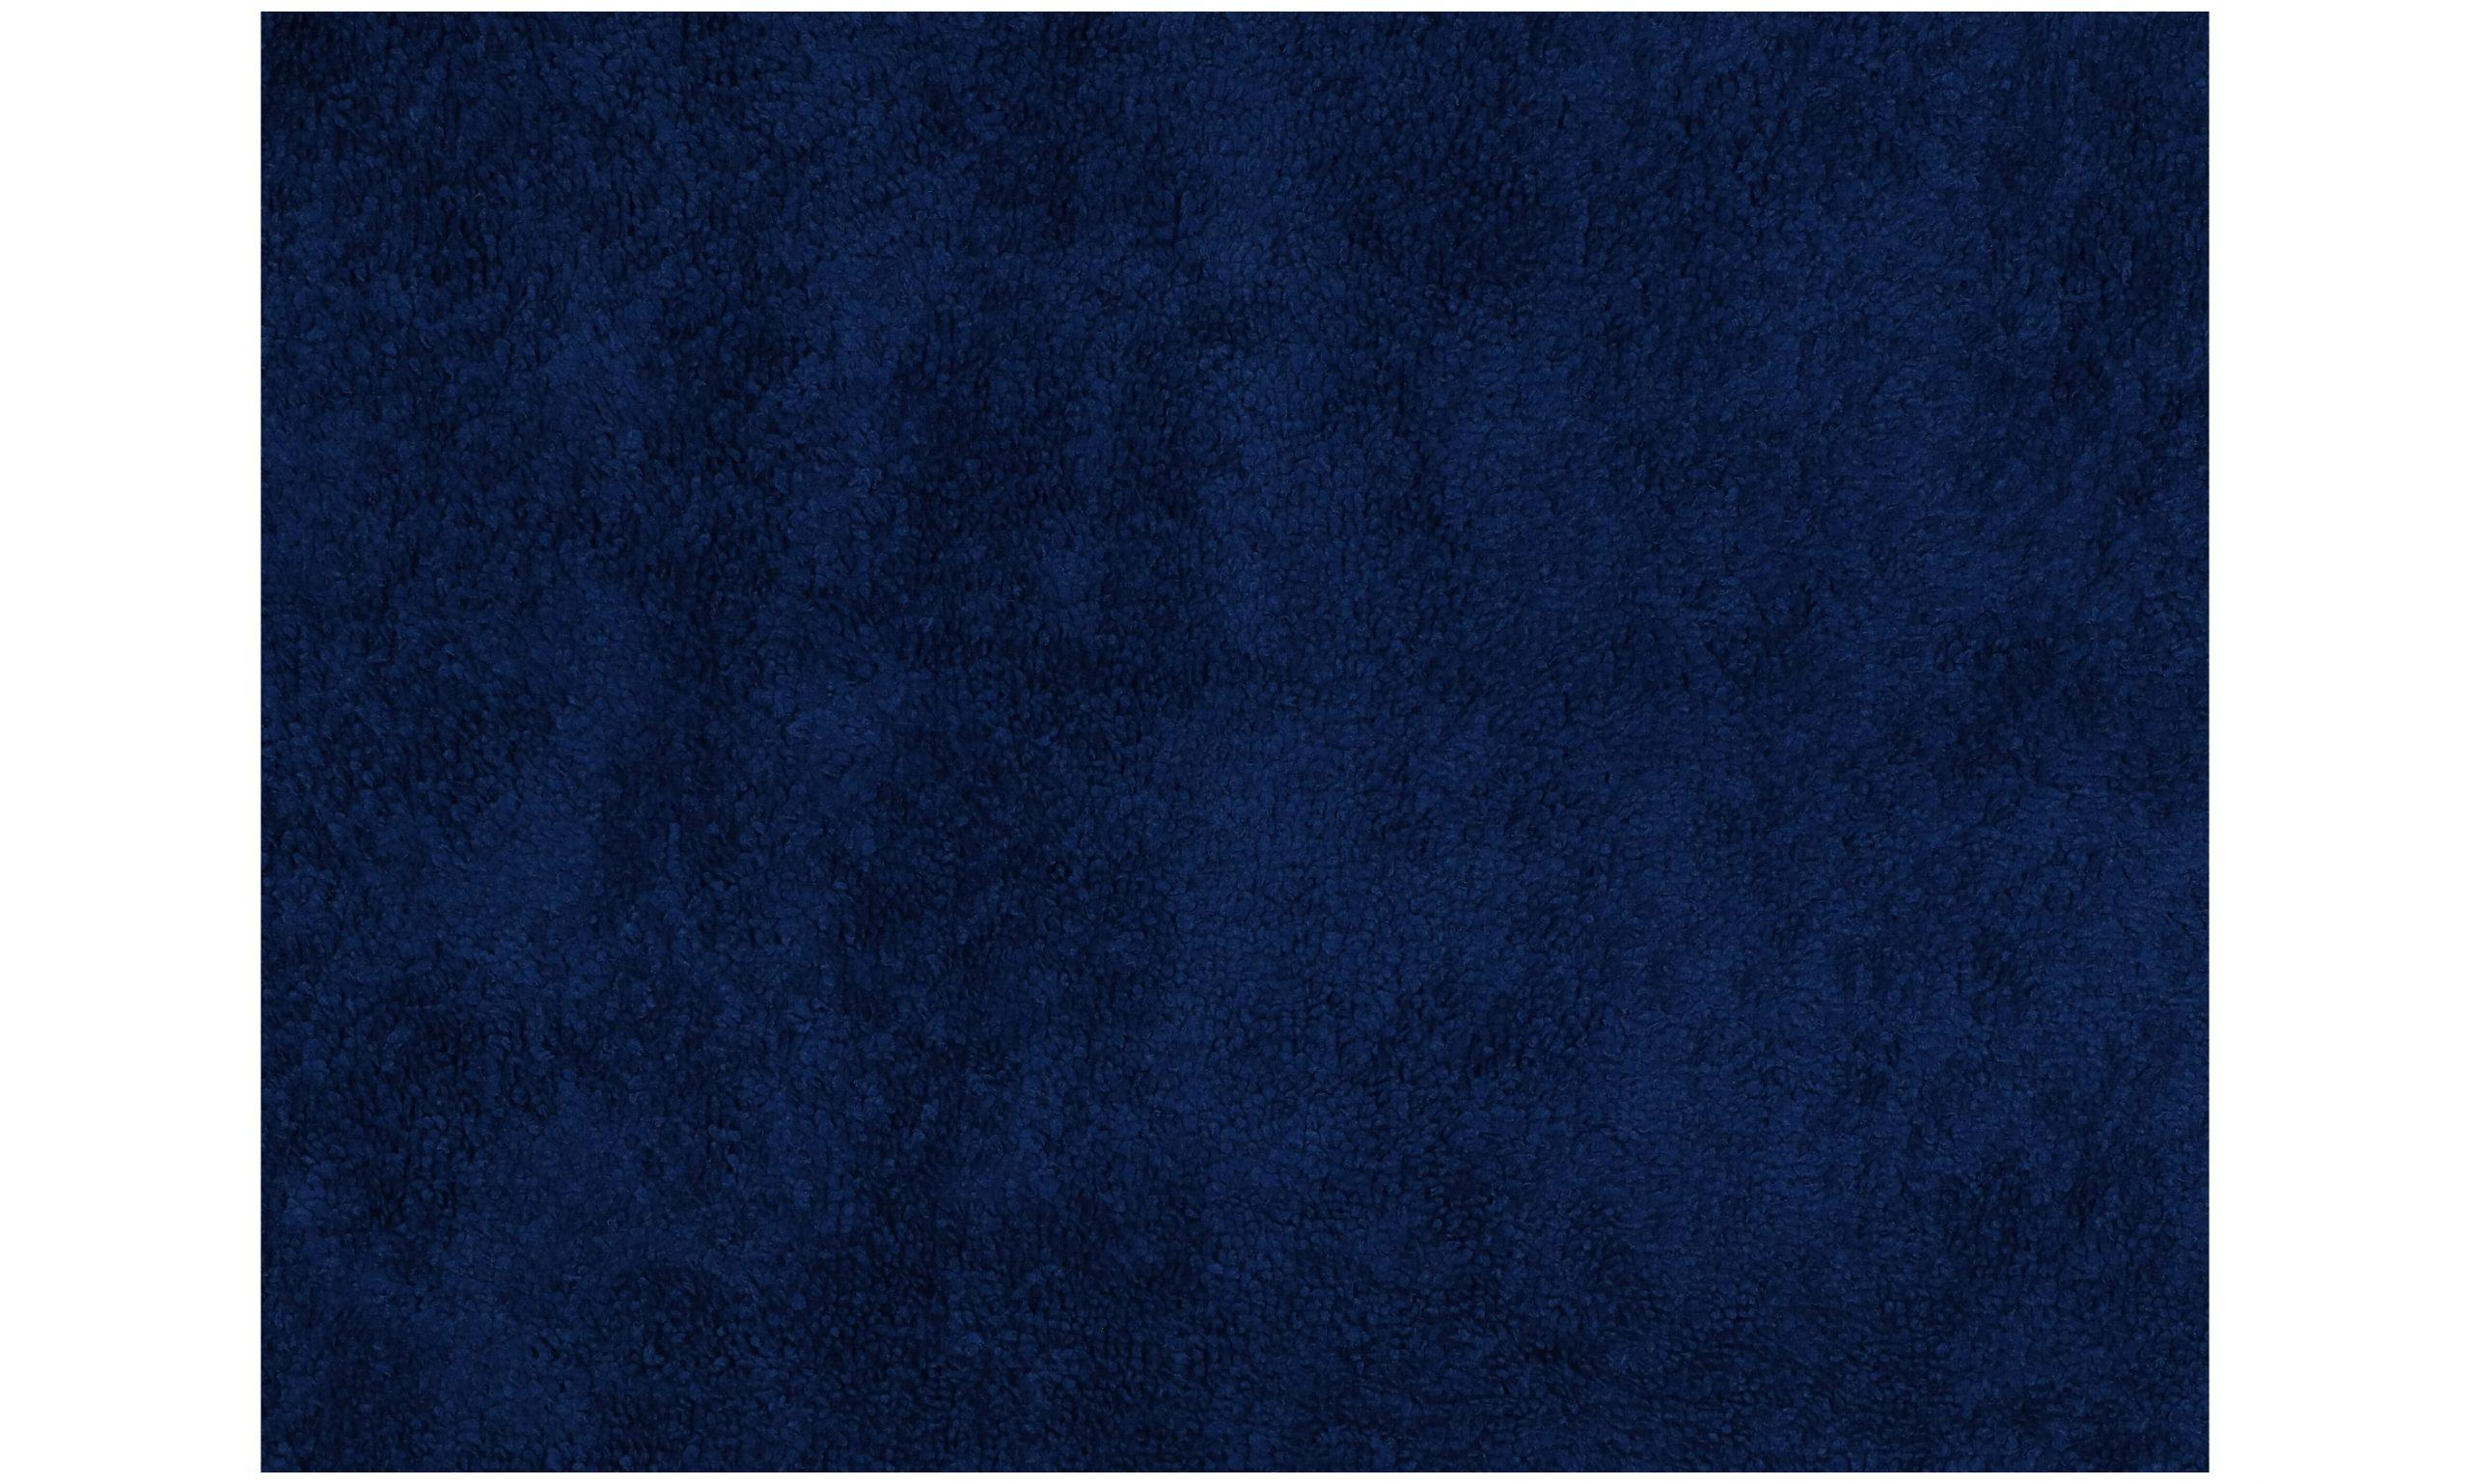 Large Microfiber cloth